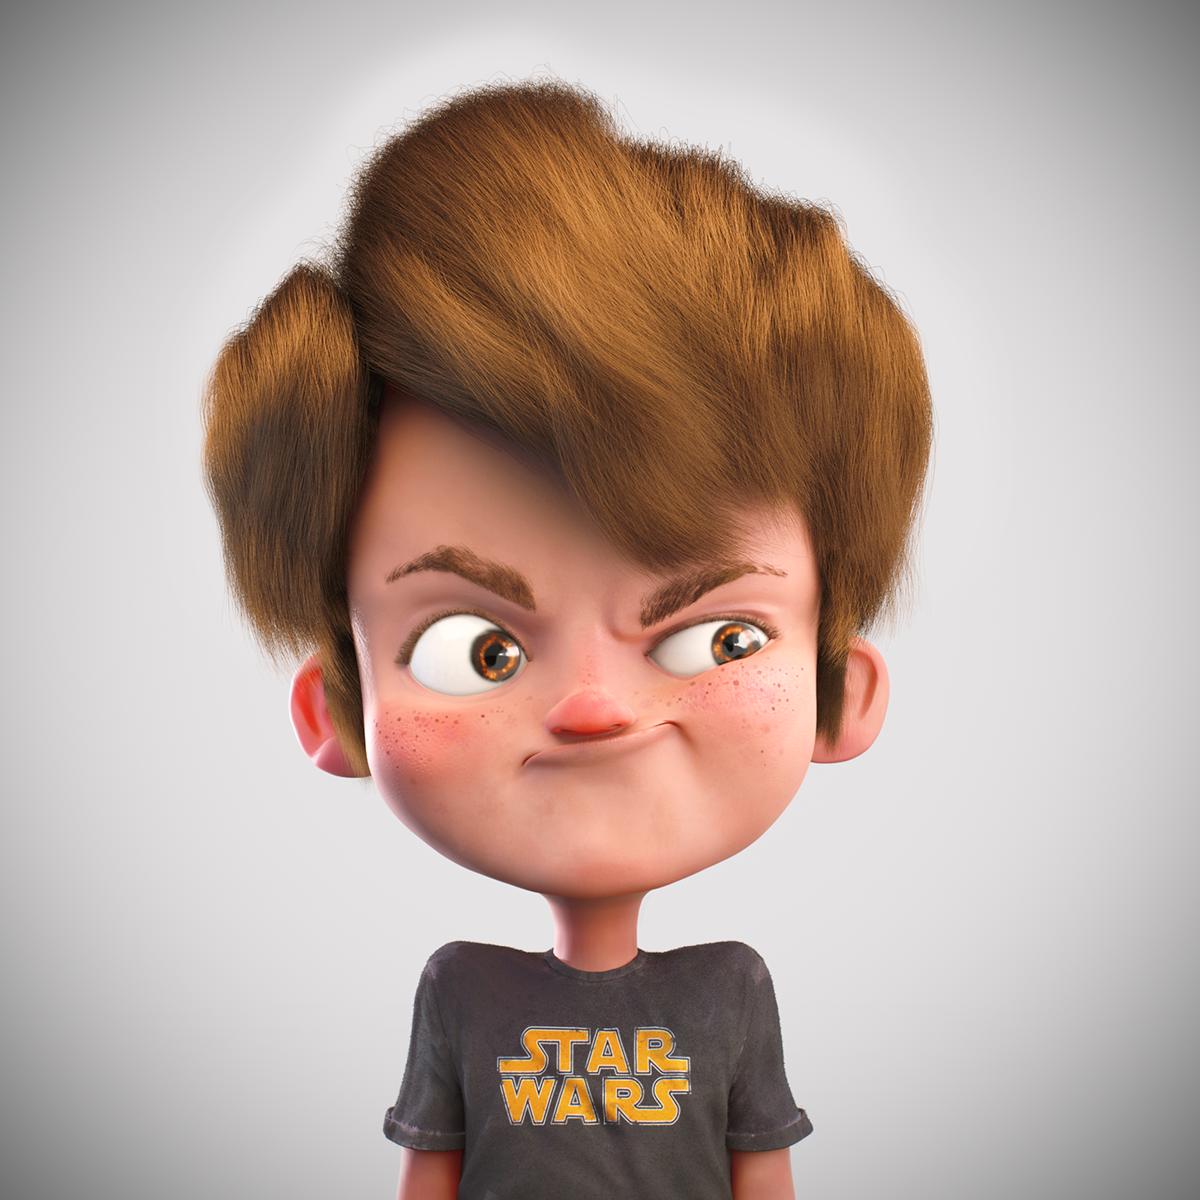 Star Wars Kid On Behance Cartoon Character Design Cartoon Girl Drawing Illustration Character Design